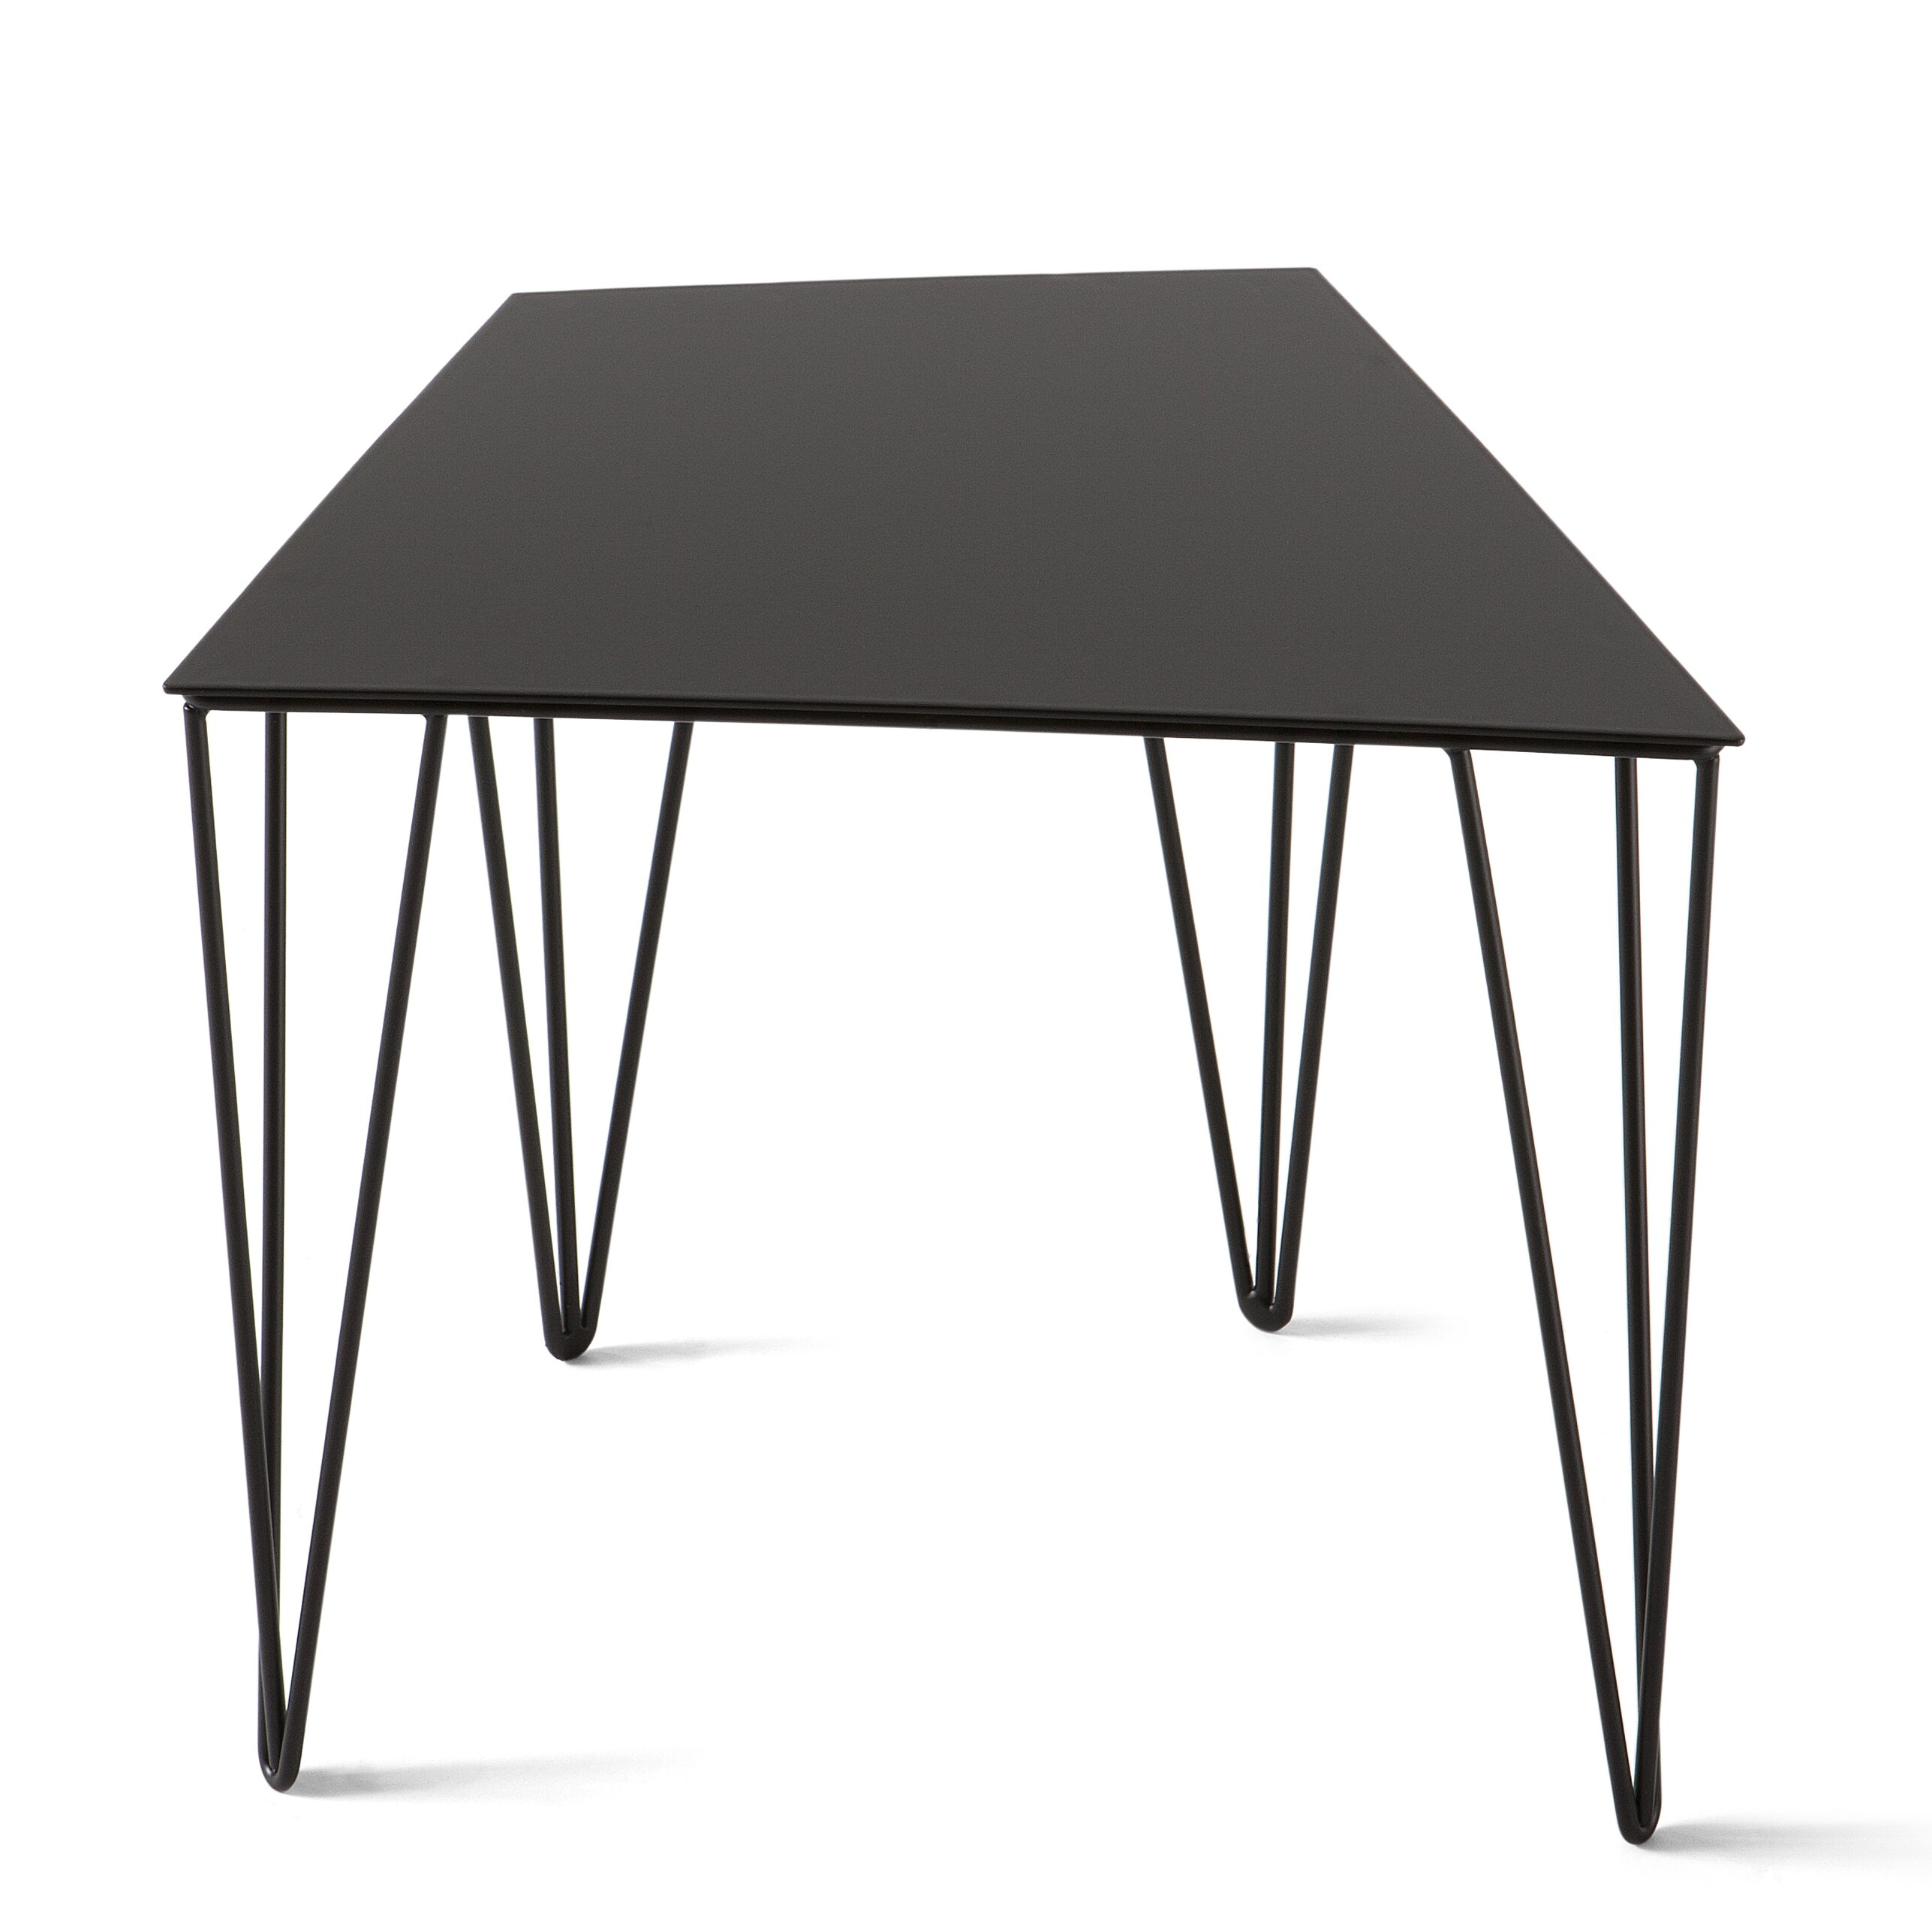 atipico chele coffee table reviews wayfair. Black Bedroom Furniture Sets. Home Design Ideas